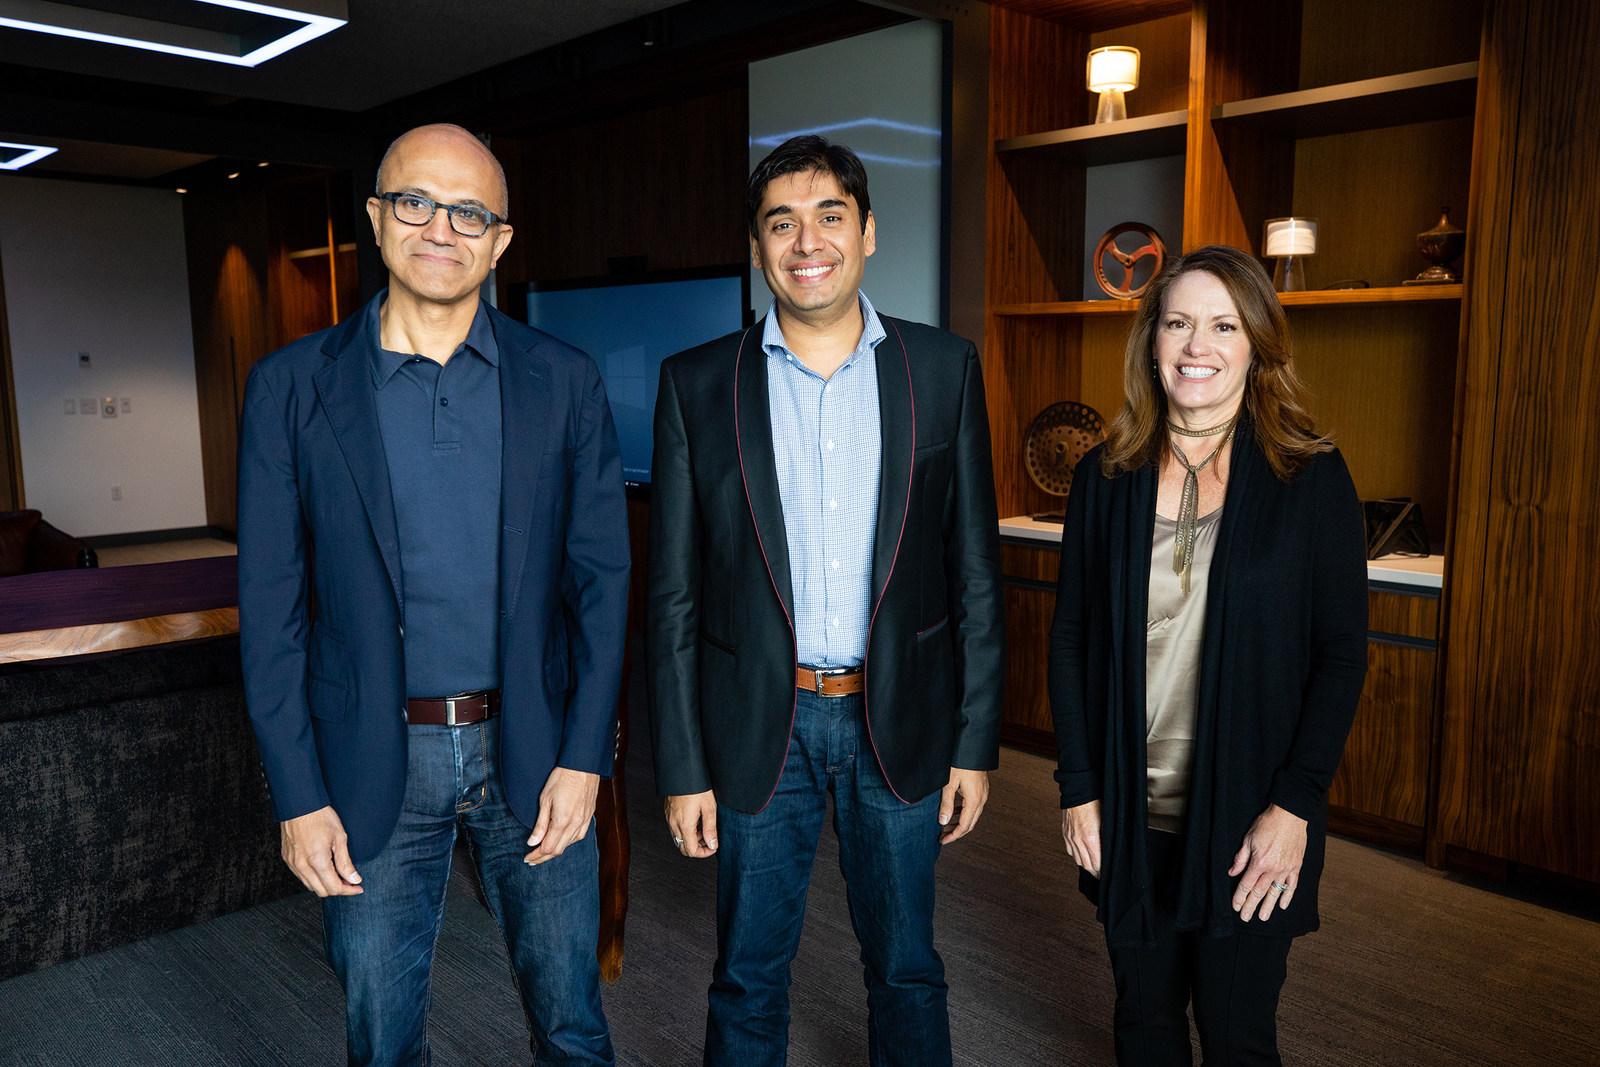 Satya Nadella (Microsoft), Naveen Tewari (InMobi), Peggy Johnson (Microsoft)